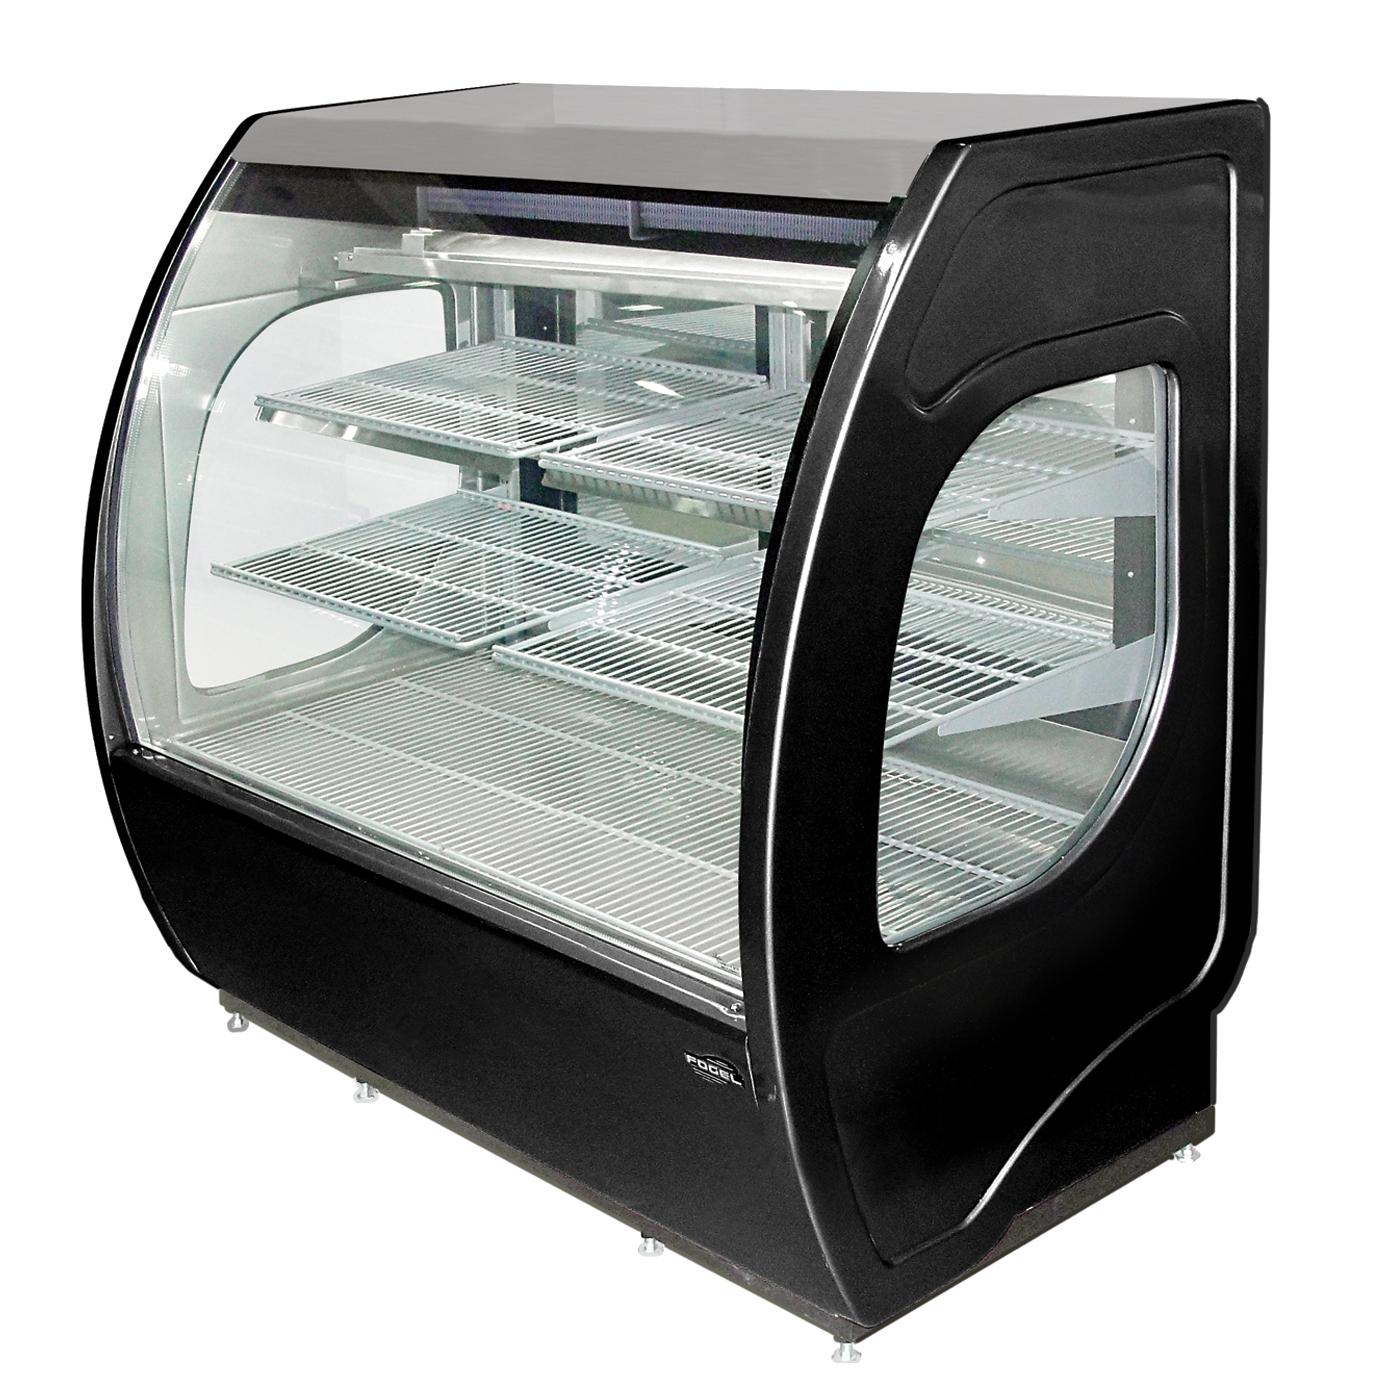 Fogel USA ELITE-6-DC-B display case, refrigerated deli